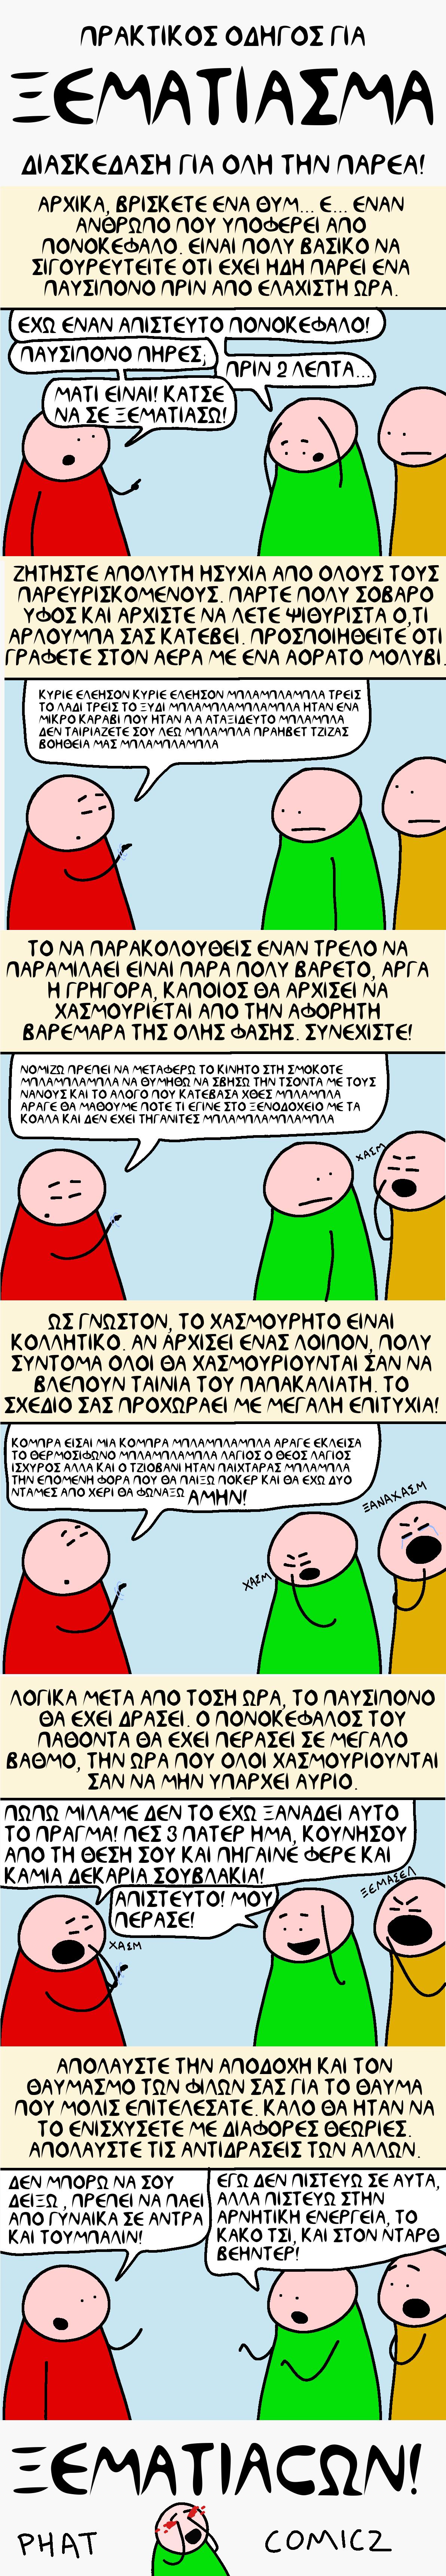 ksematiasma